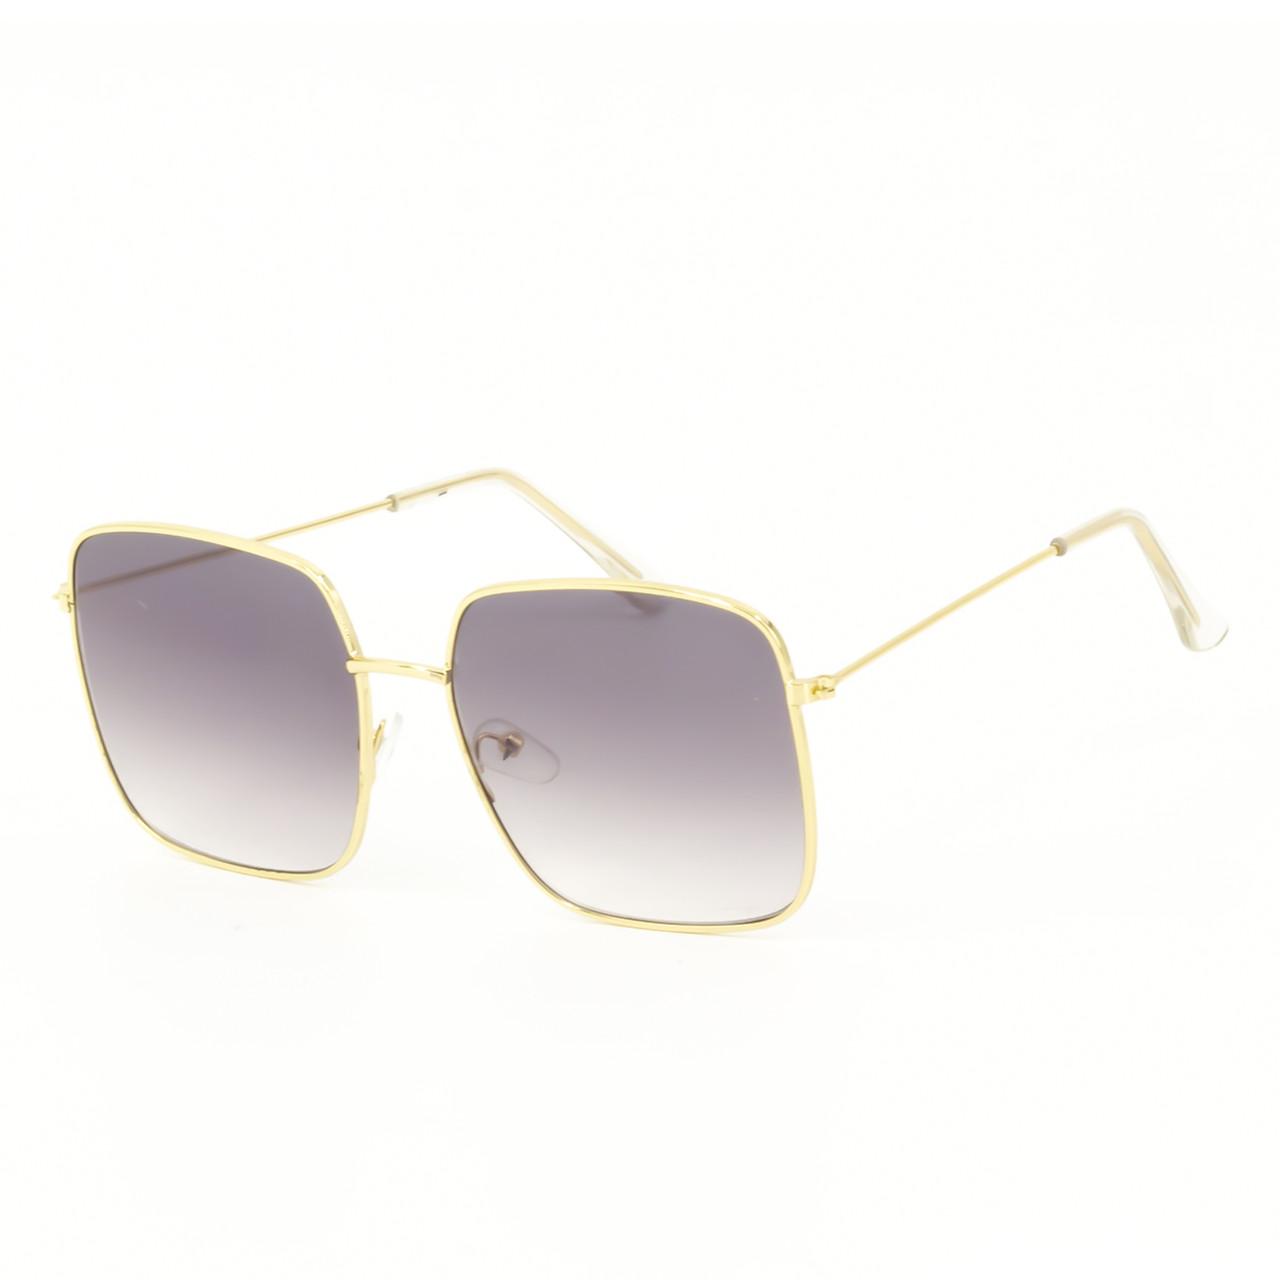 Сонцезахисні окуляри Marmilen 321 C2 крочневые ( YU321-02 )